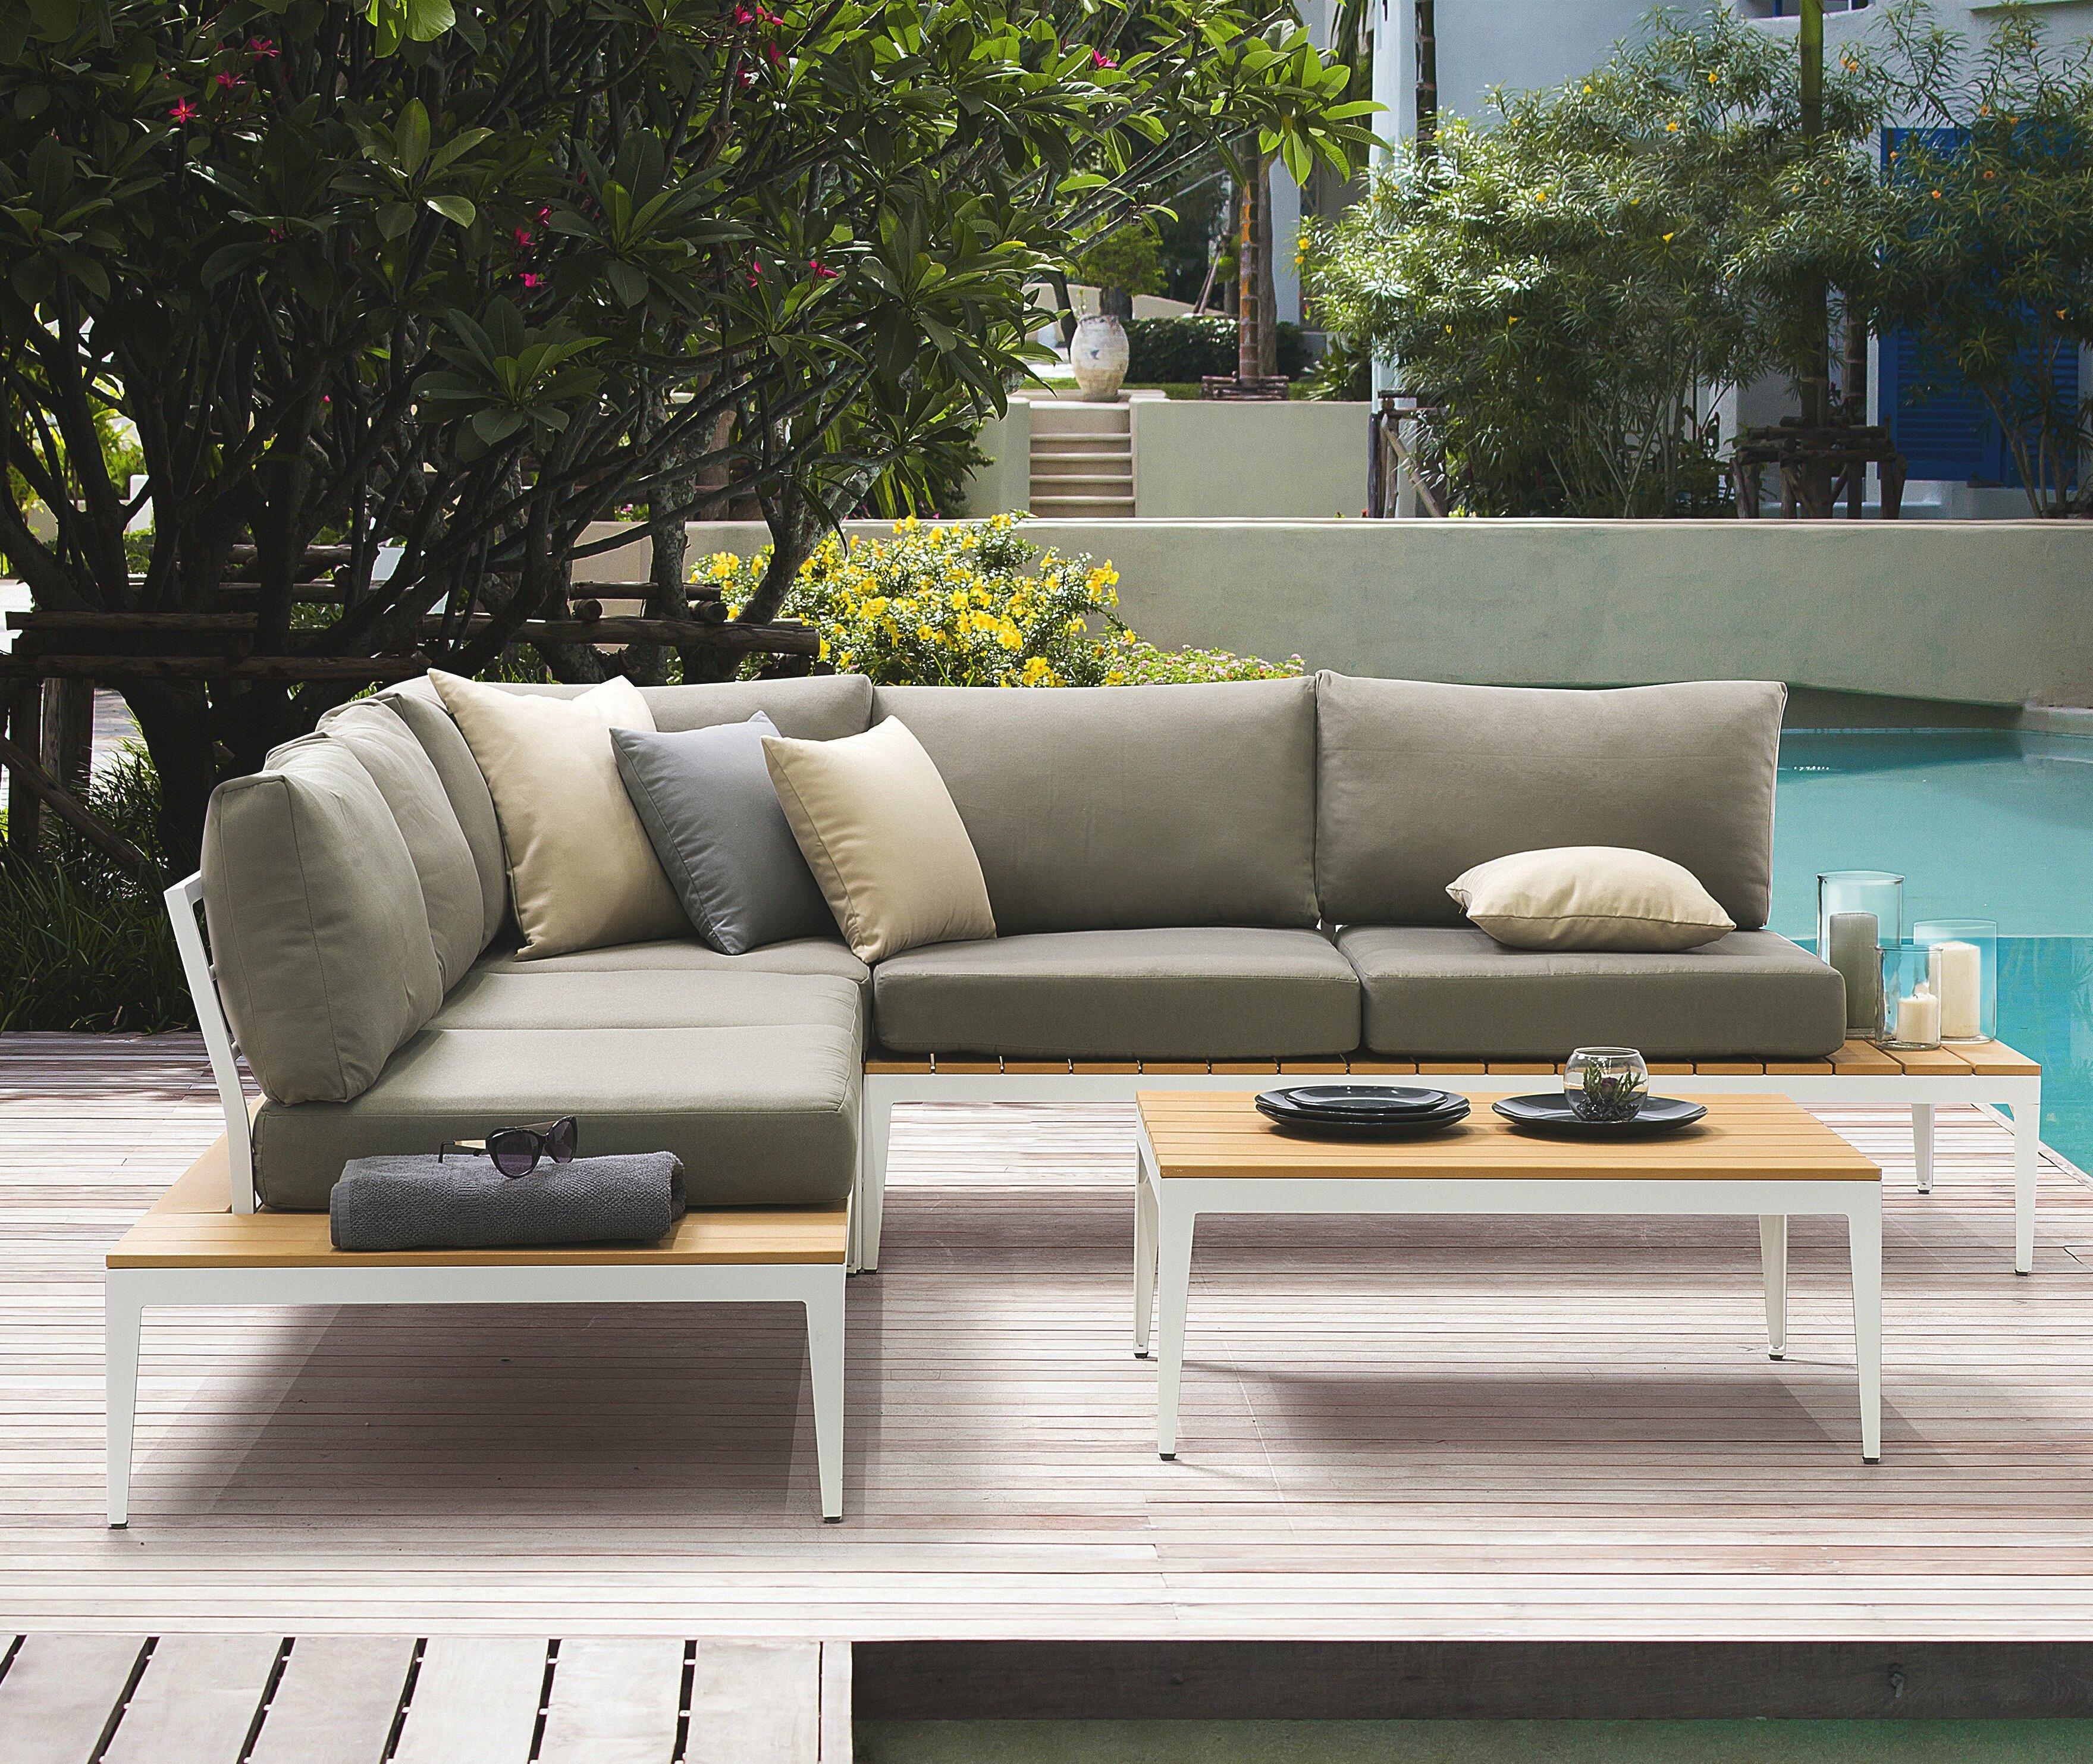 designer fashion d3dda 92547 Kirch 5 Seater Corner Sofa Set